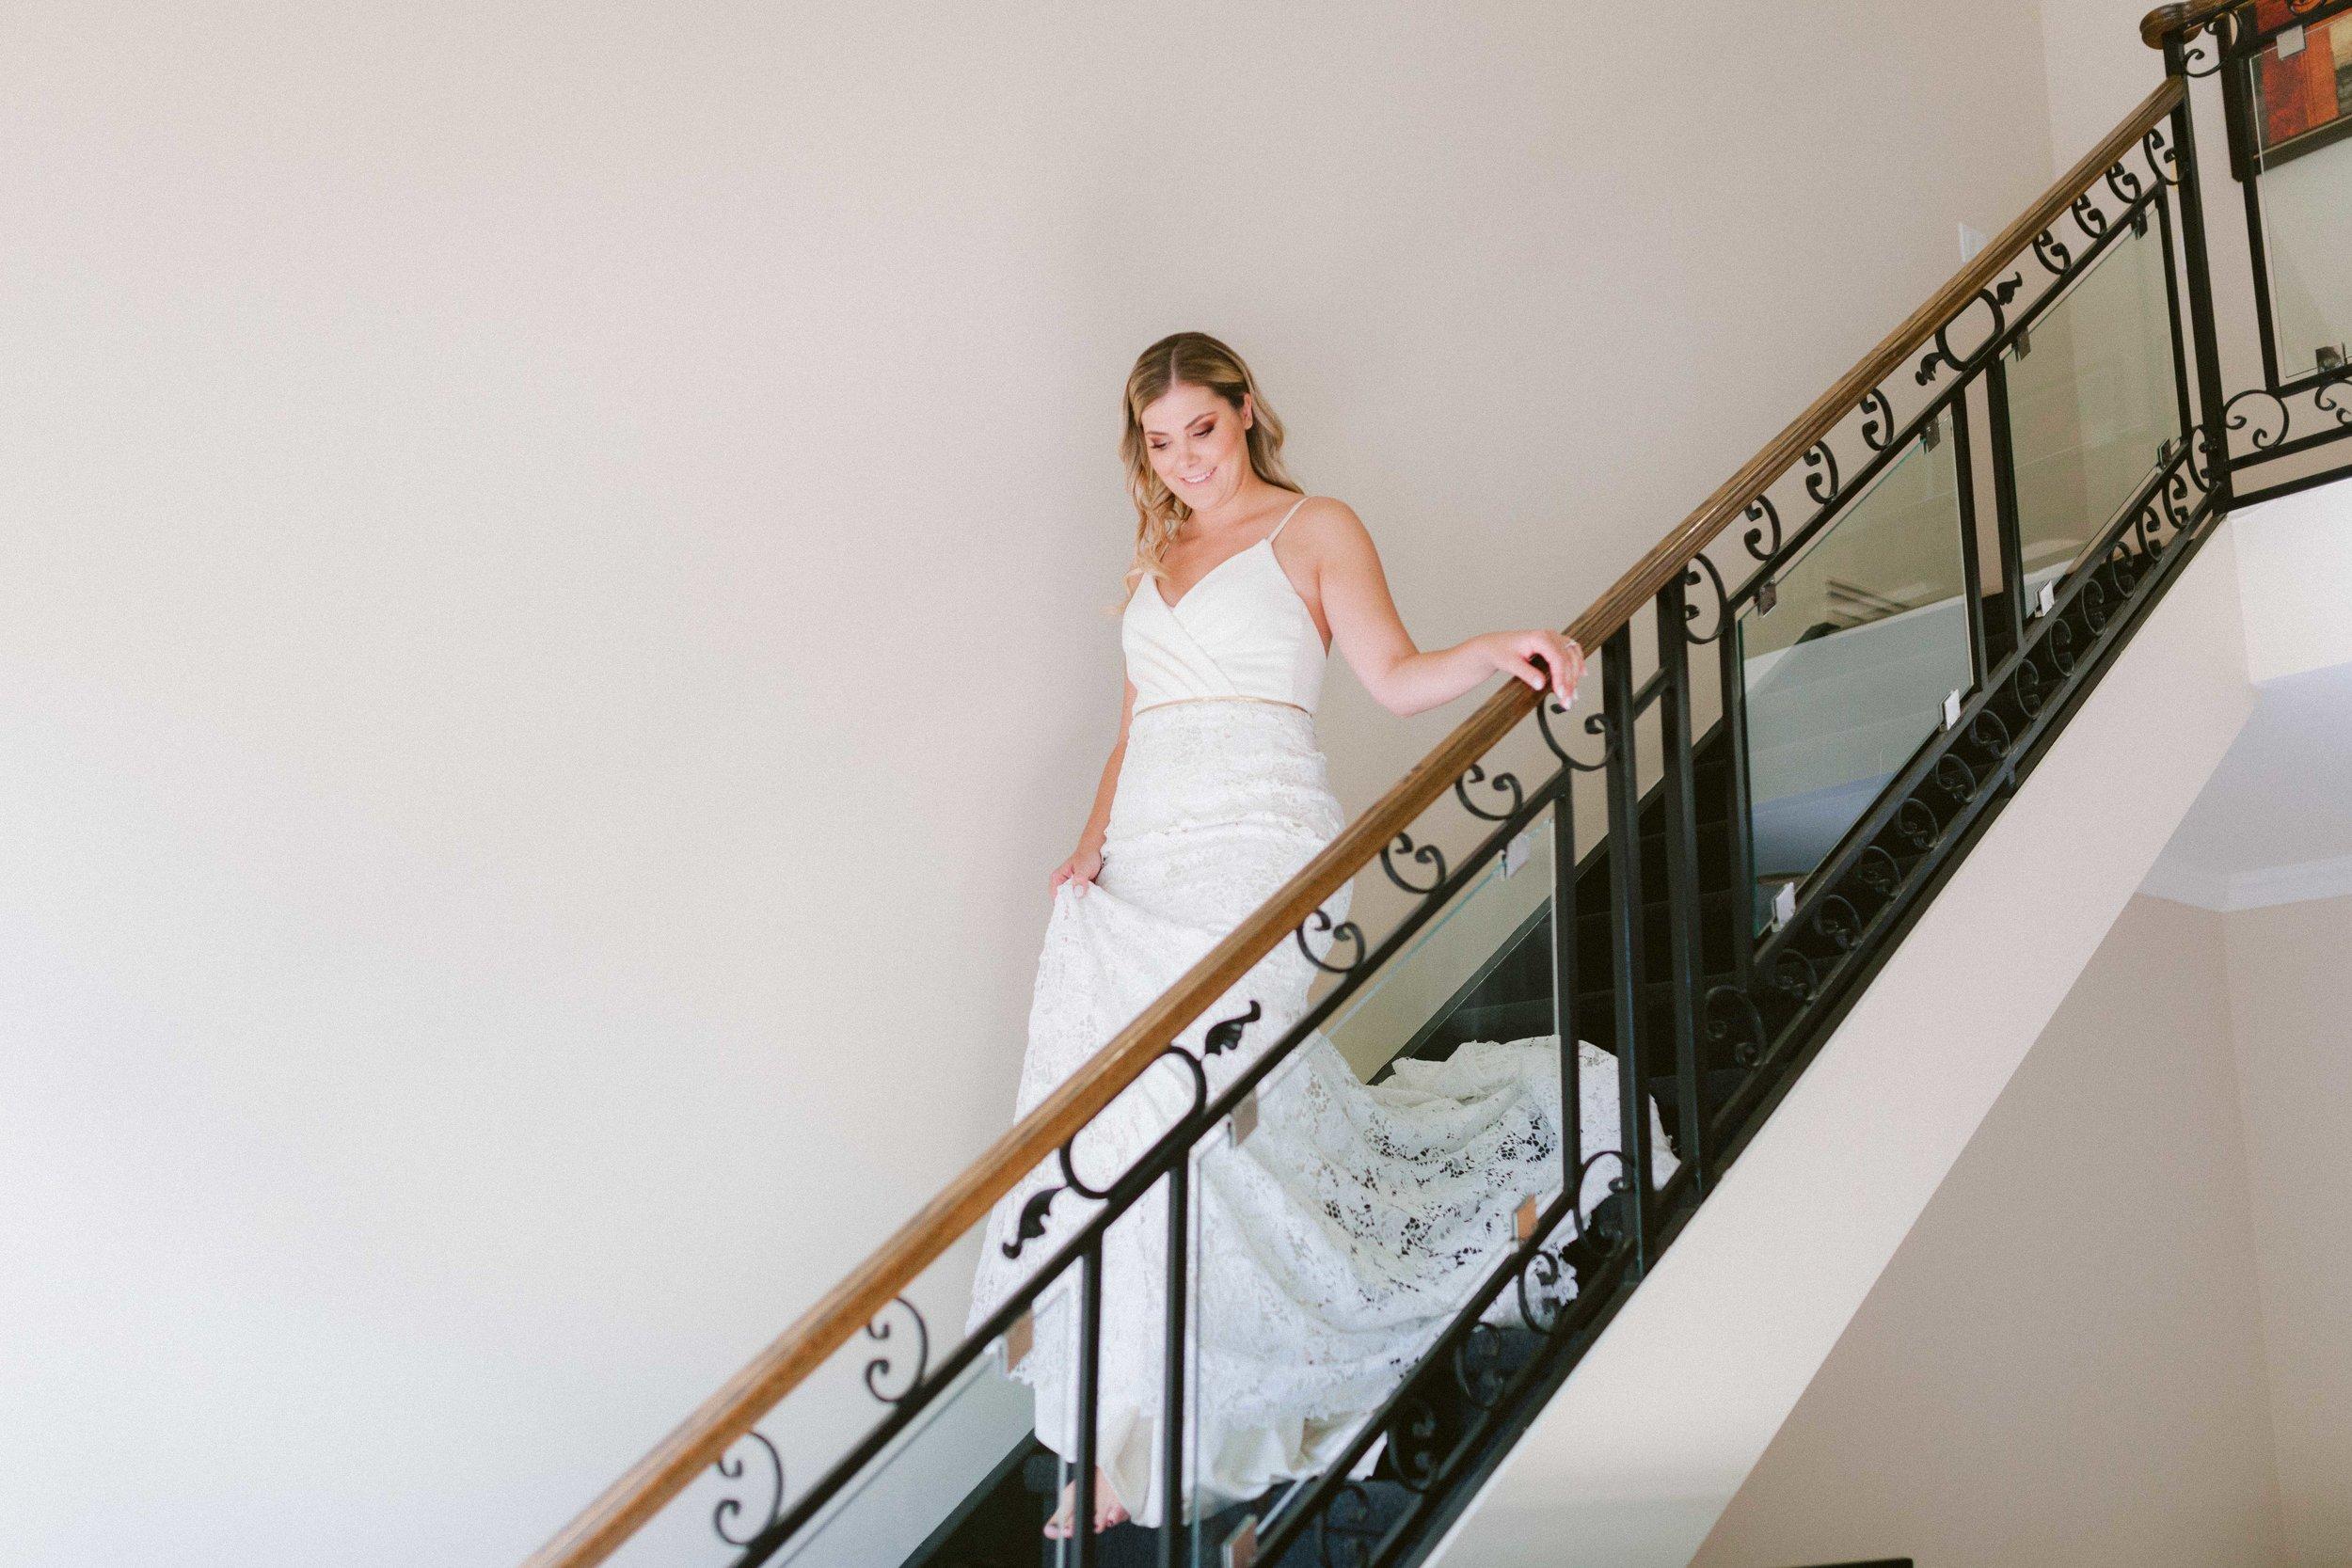 Summer_Engagament_Session_Toronto_Niagara_Wedding_Photographer (8 of 15).jpg